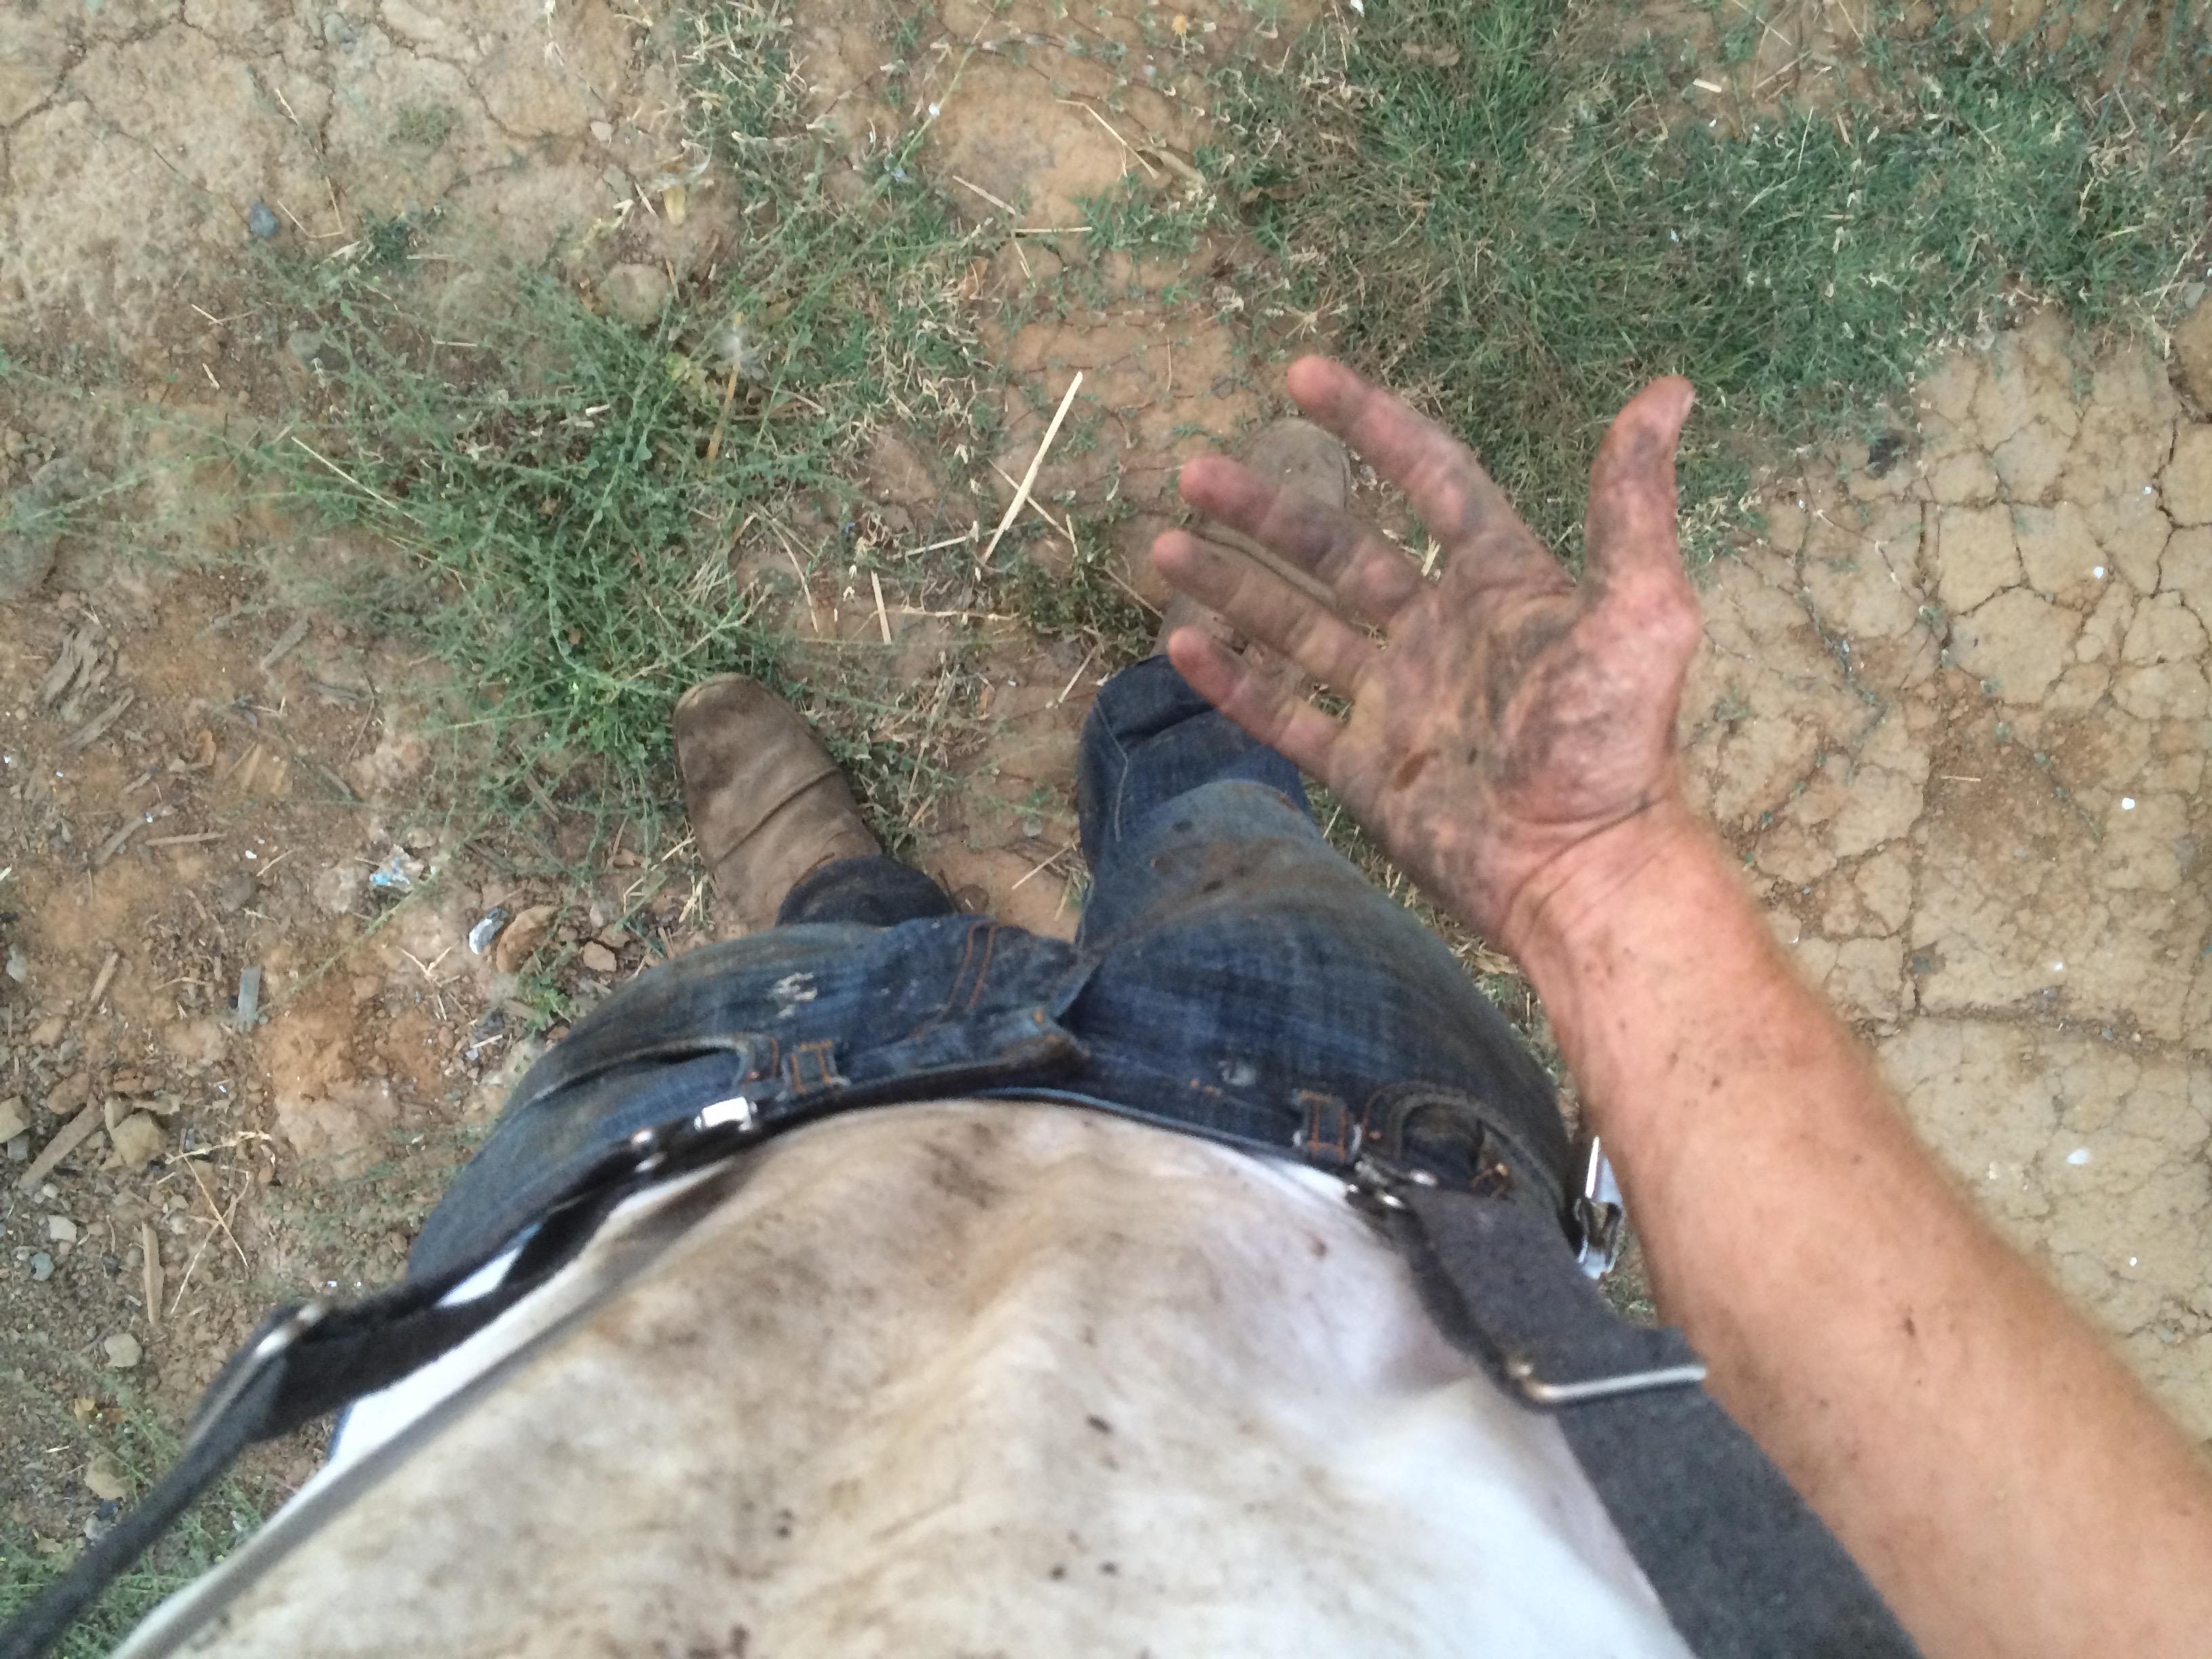 Farm Work = Dirty Work